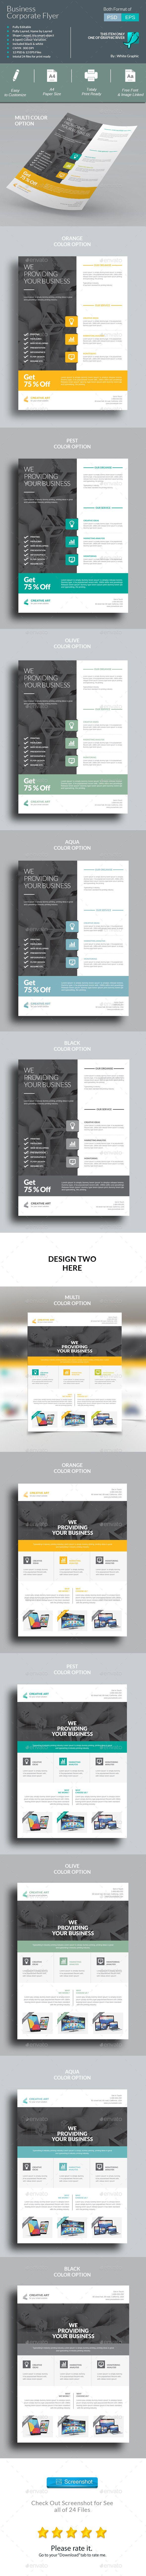 Corporate flyer Template #design Download: http://graphicriver.net/item/-corporate-flyer/12262854?ref=ksioks